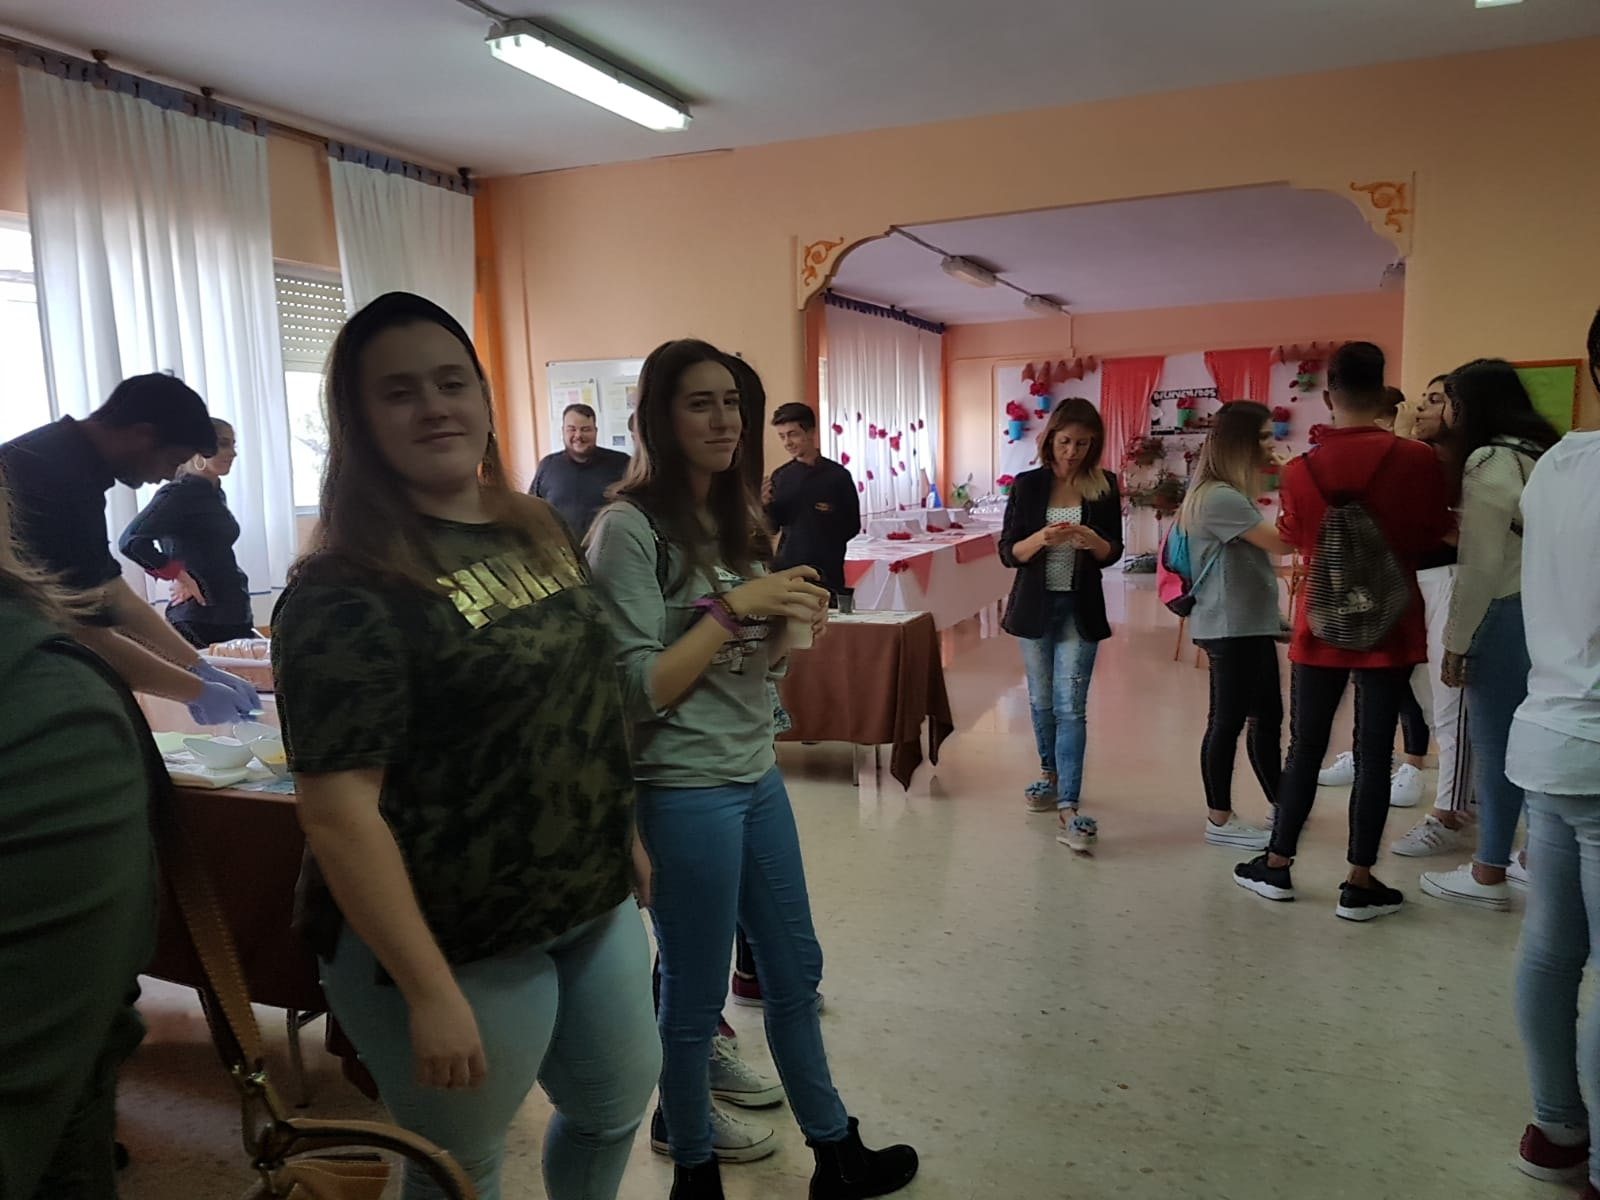 visita-CF-Motril-Salobreña-2019-12